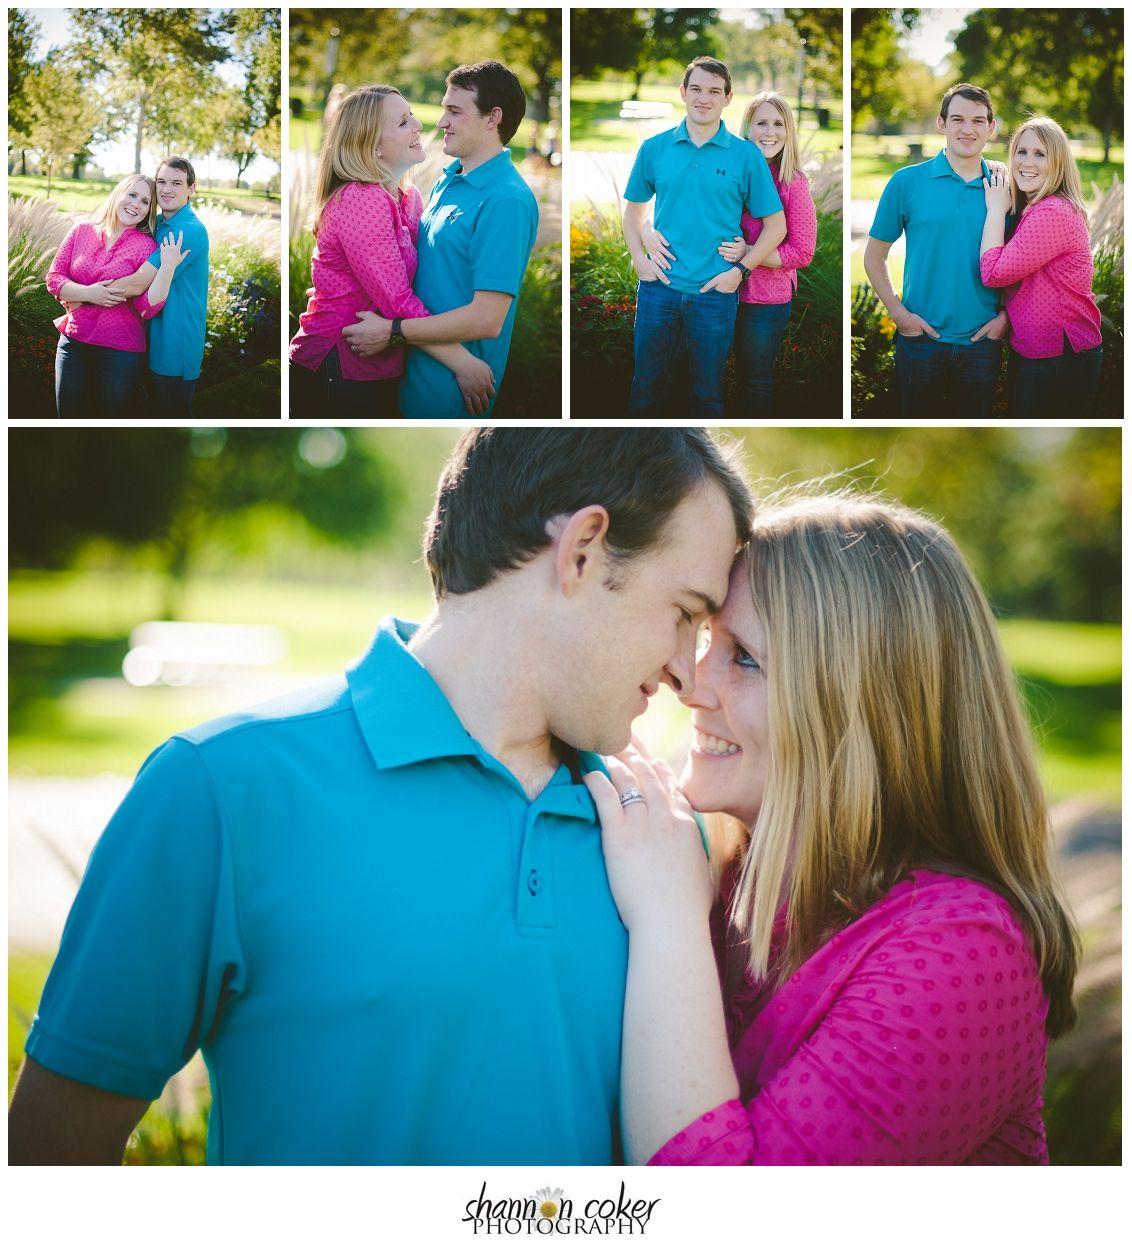 #shannoncokerphotography #couples #couplesphotos #couplesphotography #engagement #engagementphotography